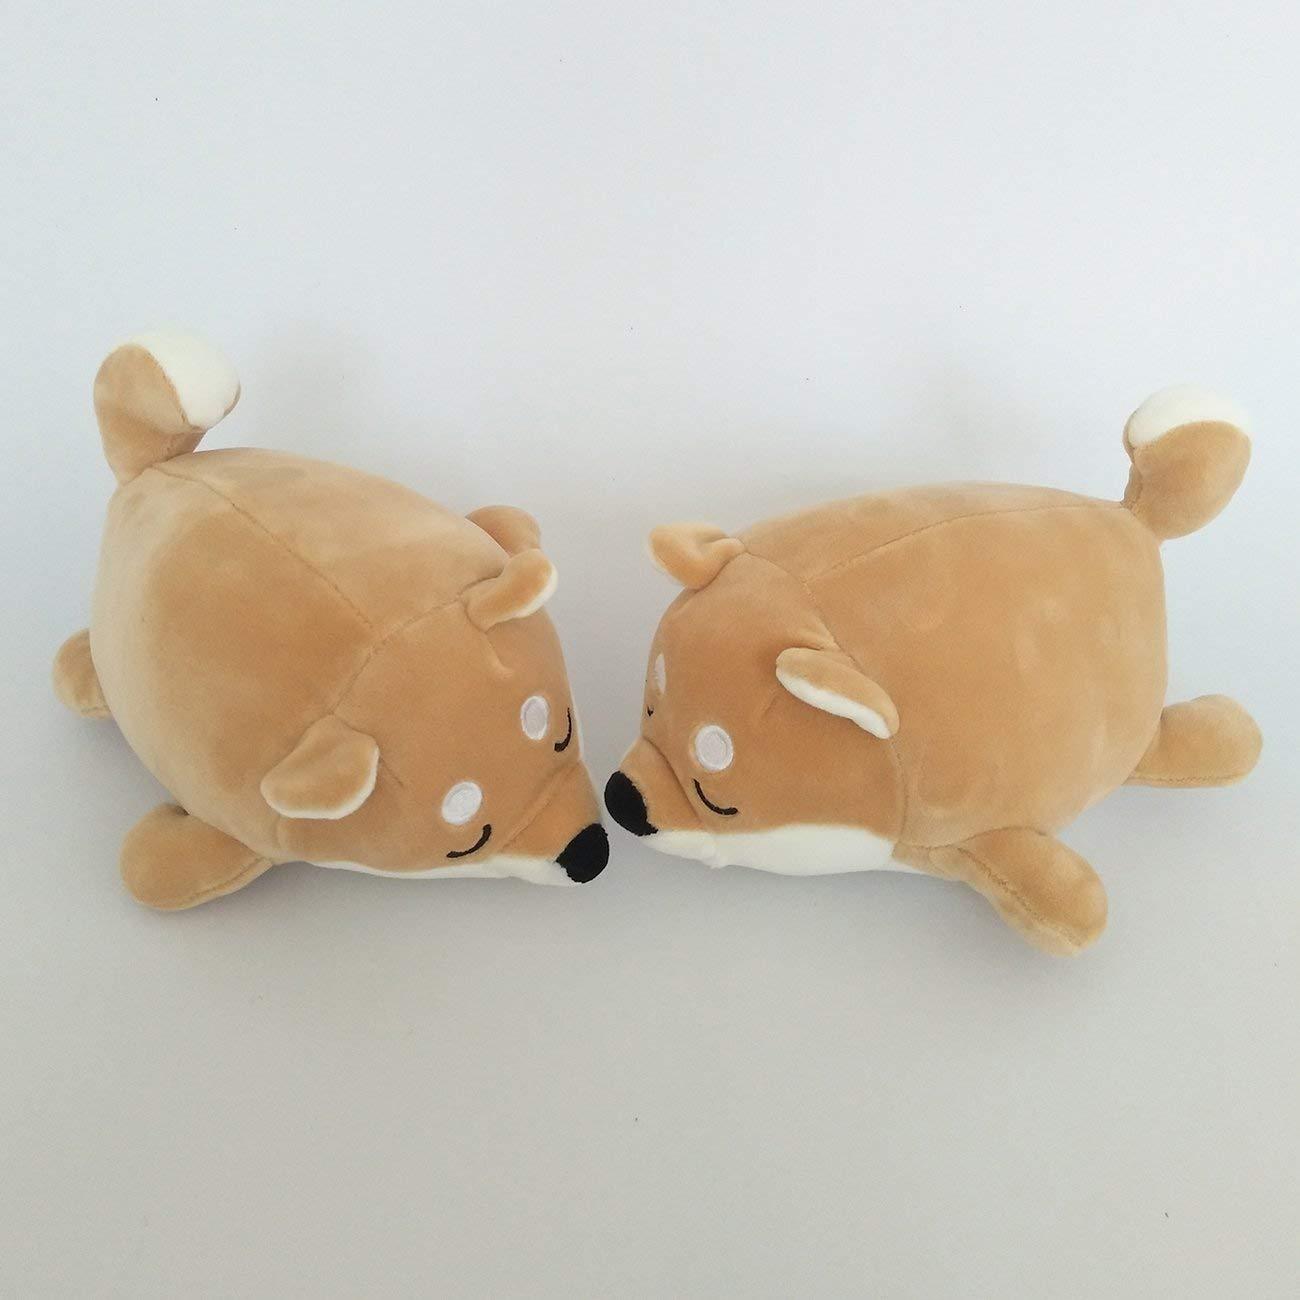 Elviray Cotton Lying Plush Stuffed Dog Large Toy Shiba Inu Dog Doll Duvet Doll Lovely Animal Children Birthday Gift Corgi Plush Pillow